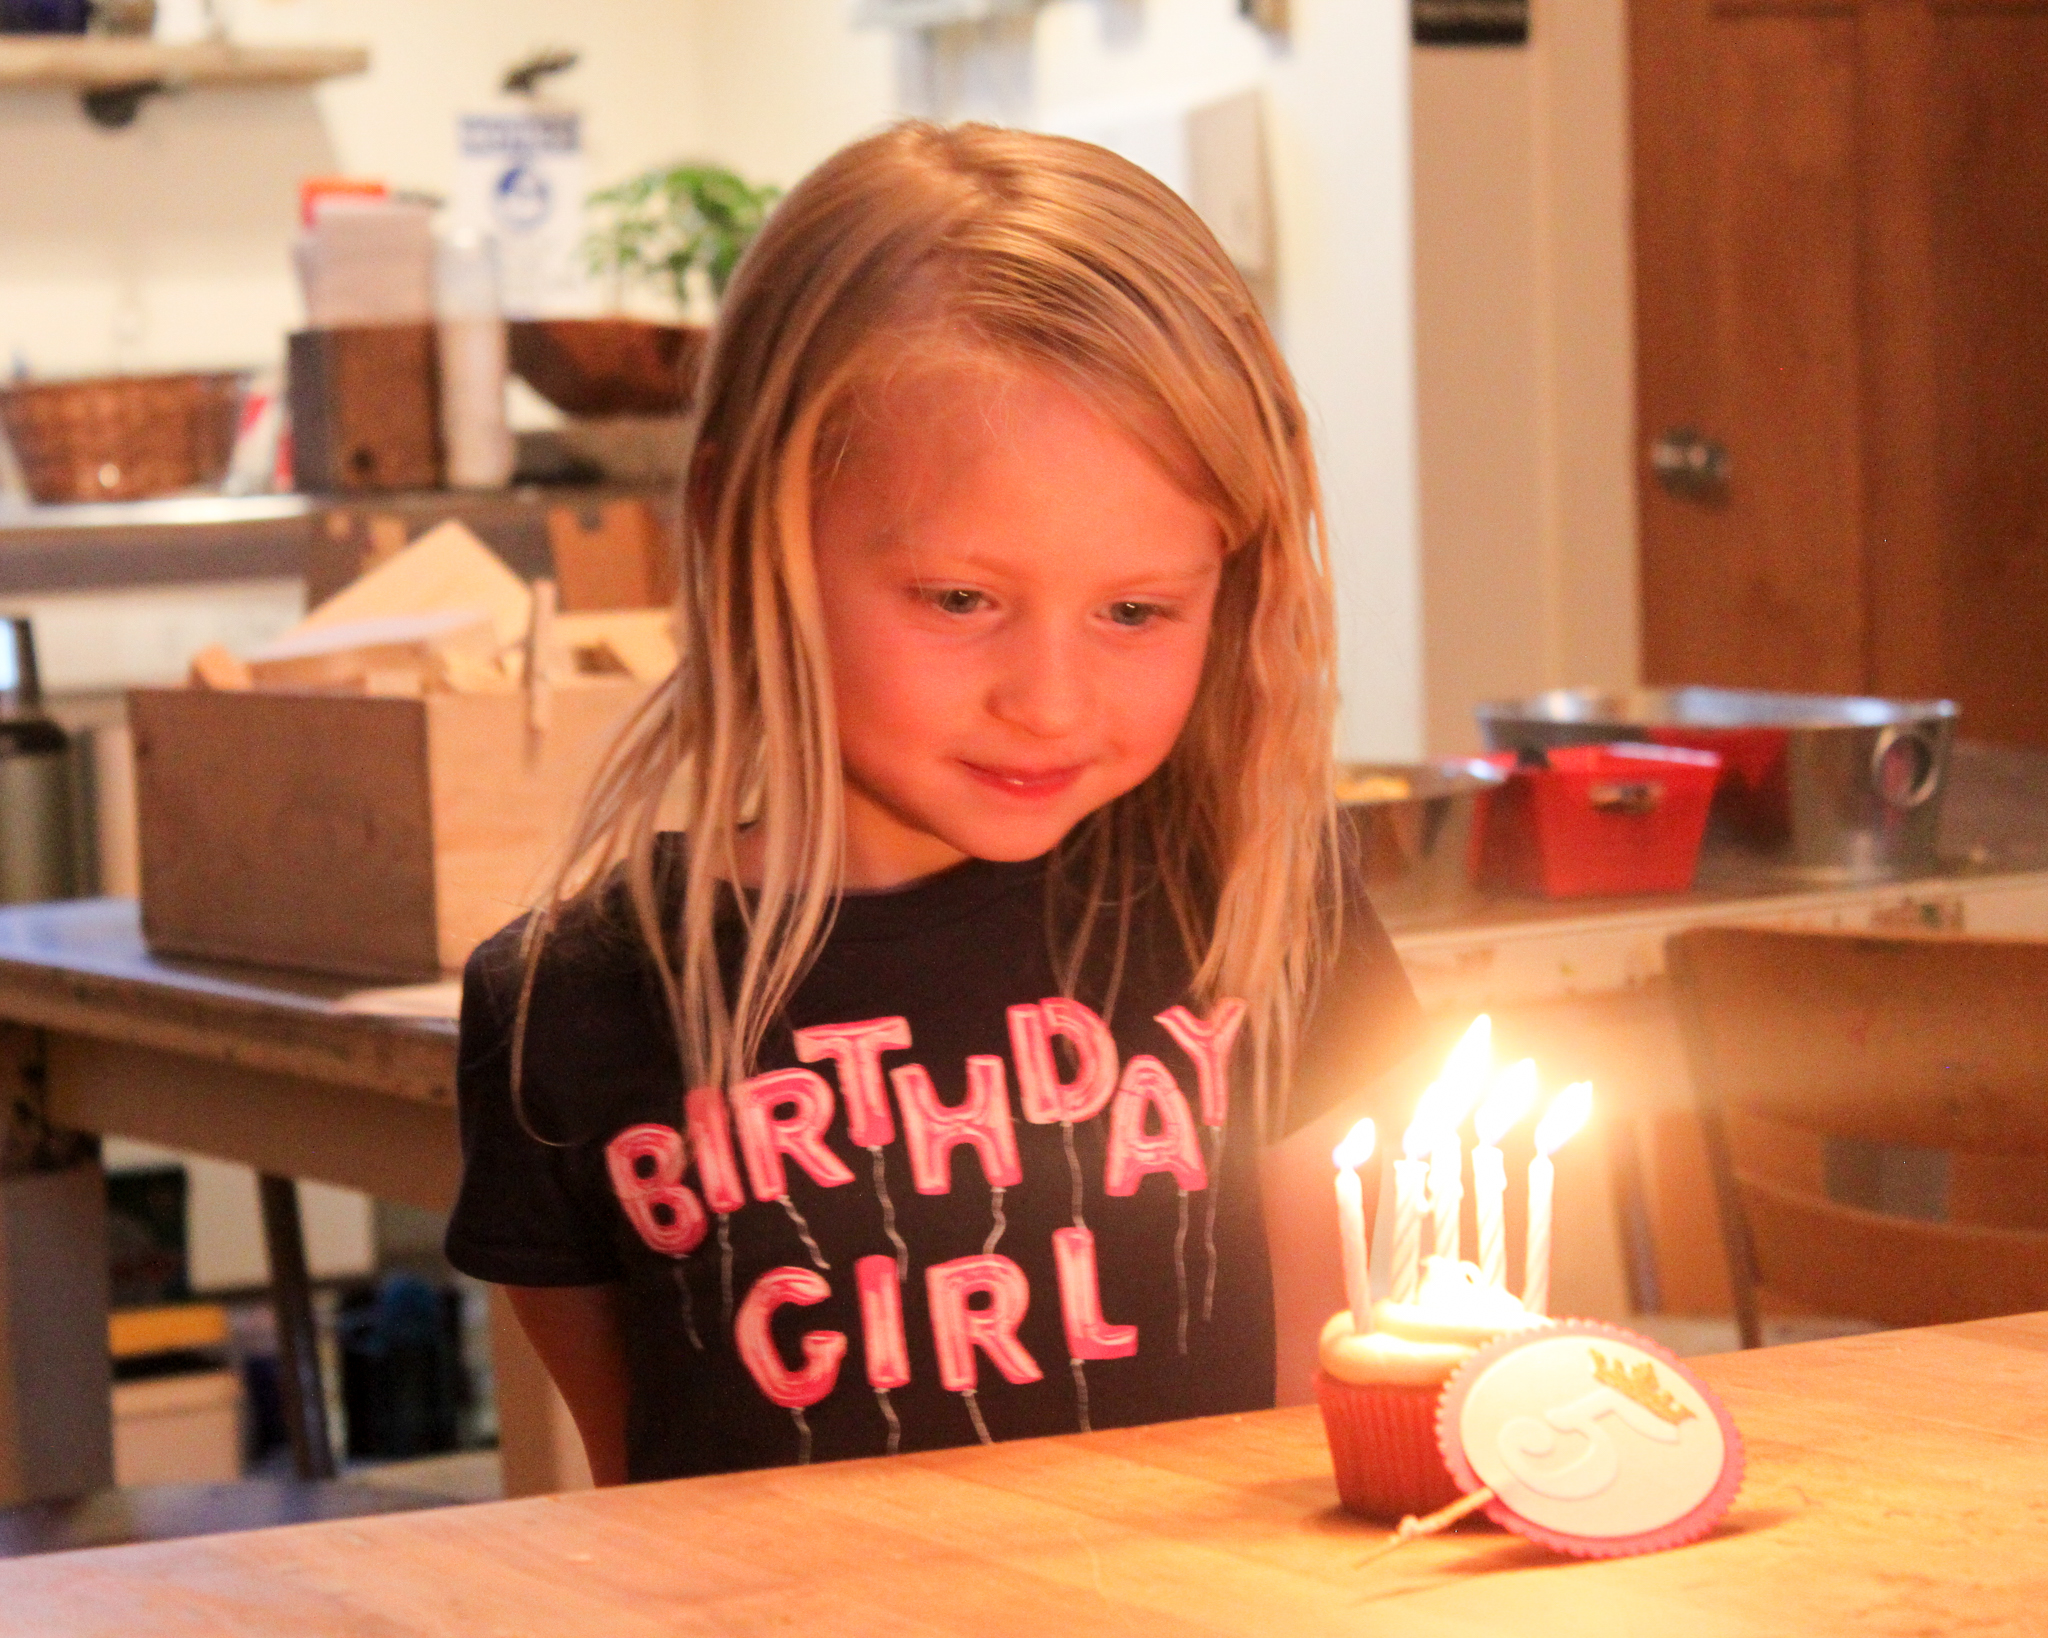 Birthday Girl with Cupcake Topper - OhSoFancyParty.com.jpg